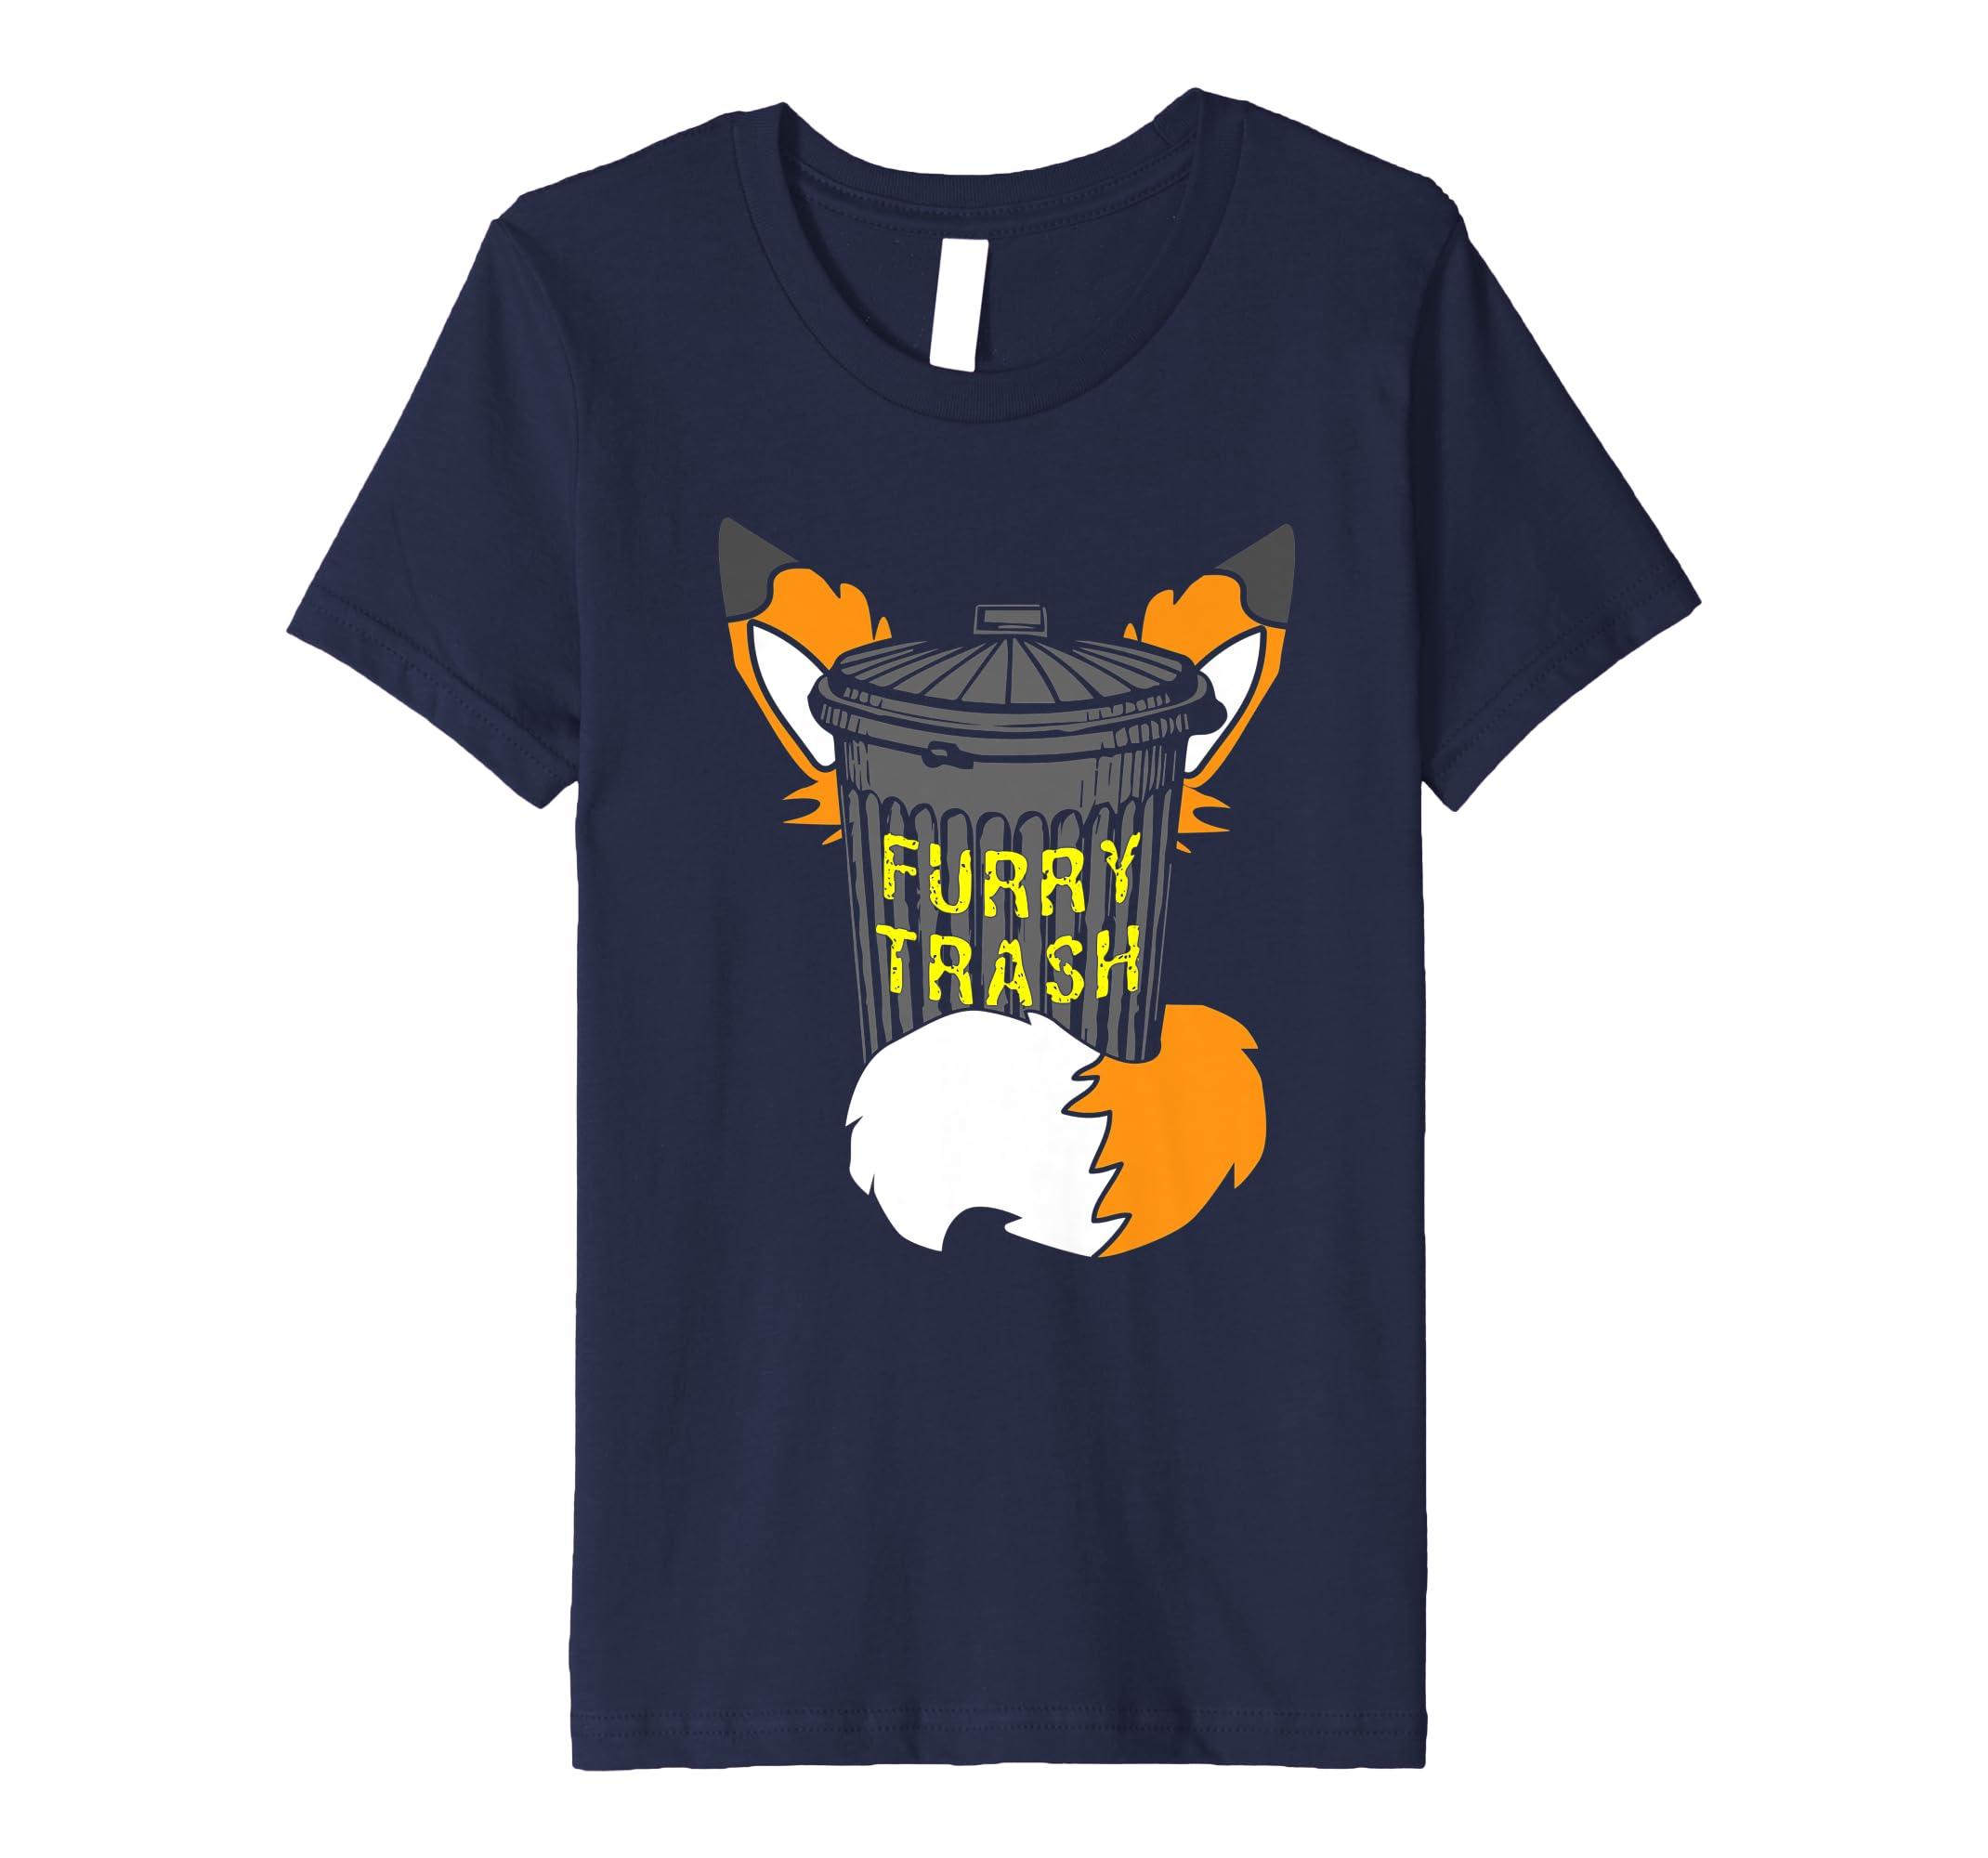 a86e4d527 Amazon.com: Fox Furry Trash Shirt Furries Tail Ears Cosplay Trash Can:  Clothing